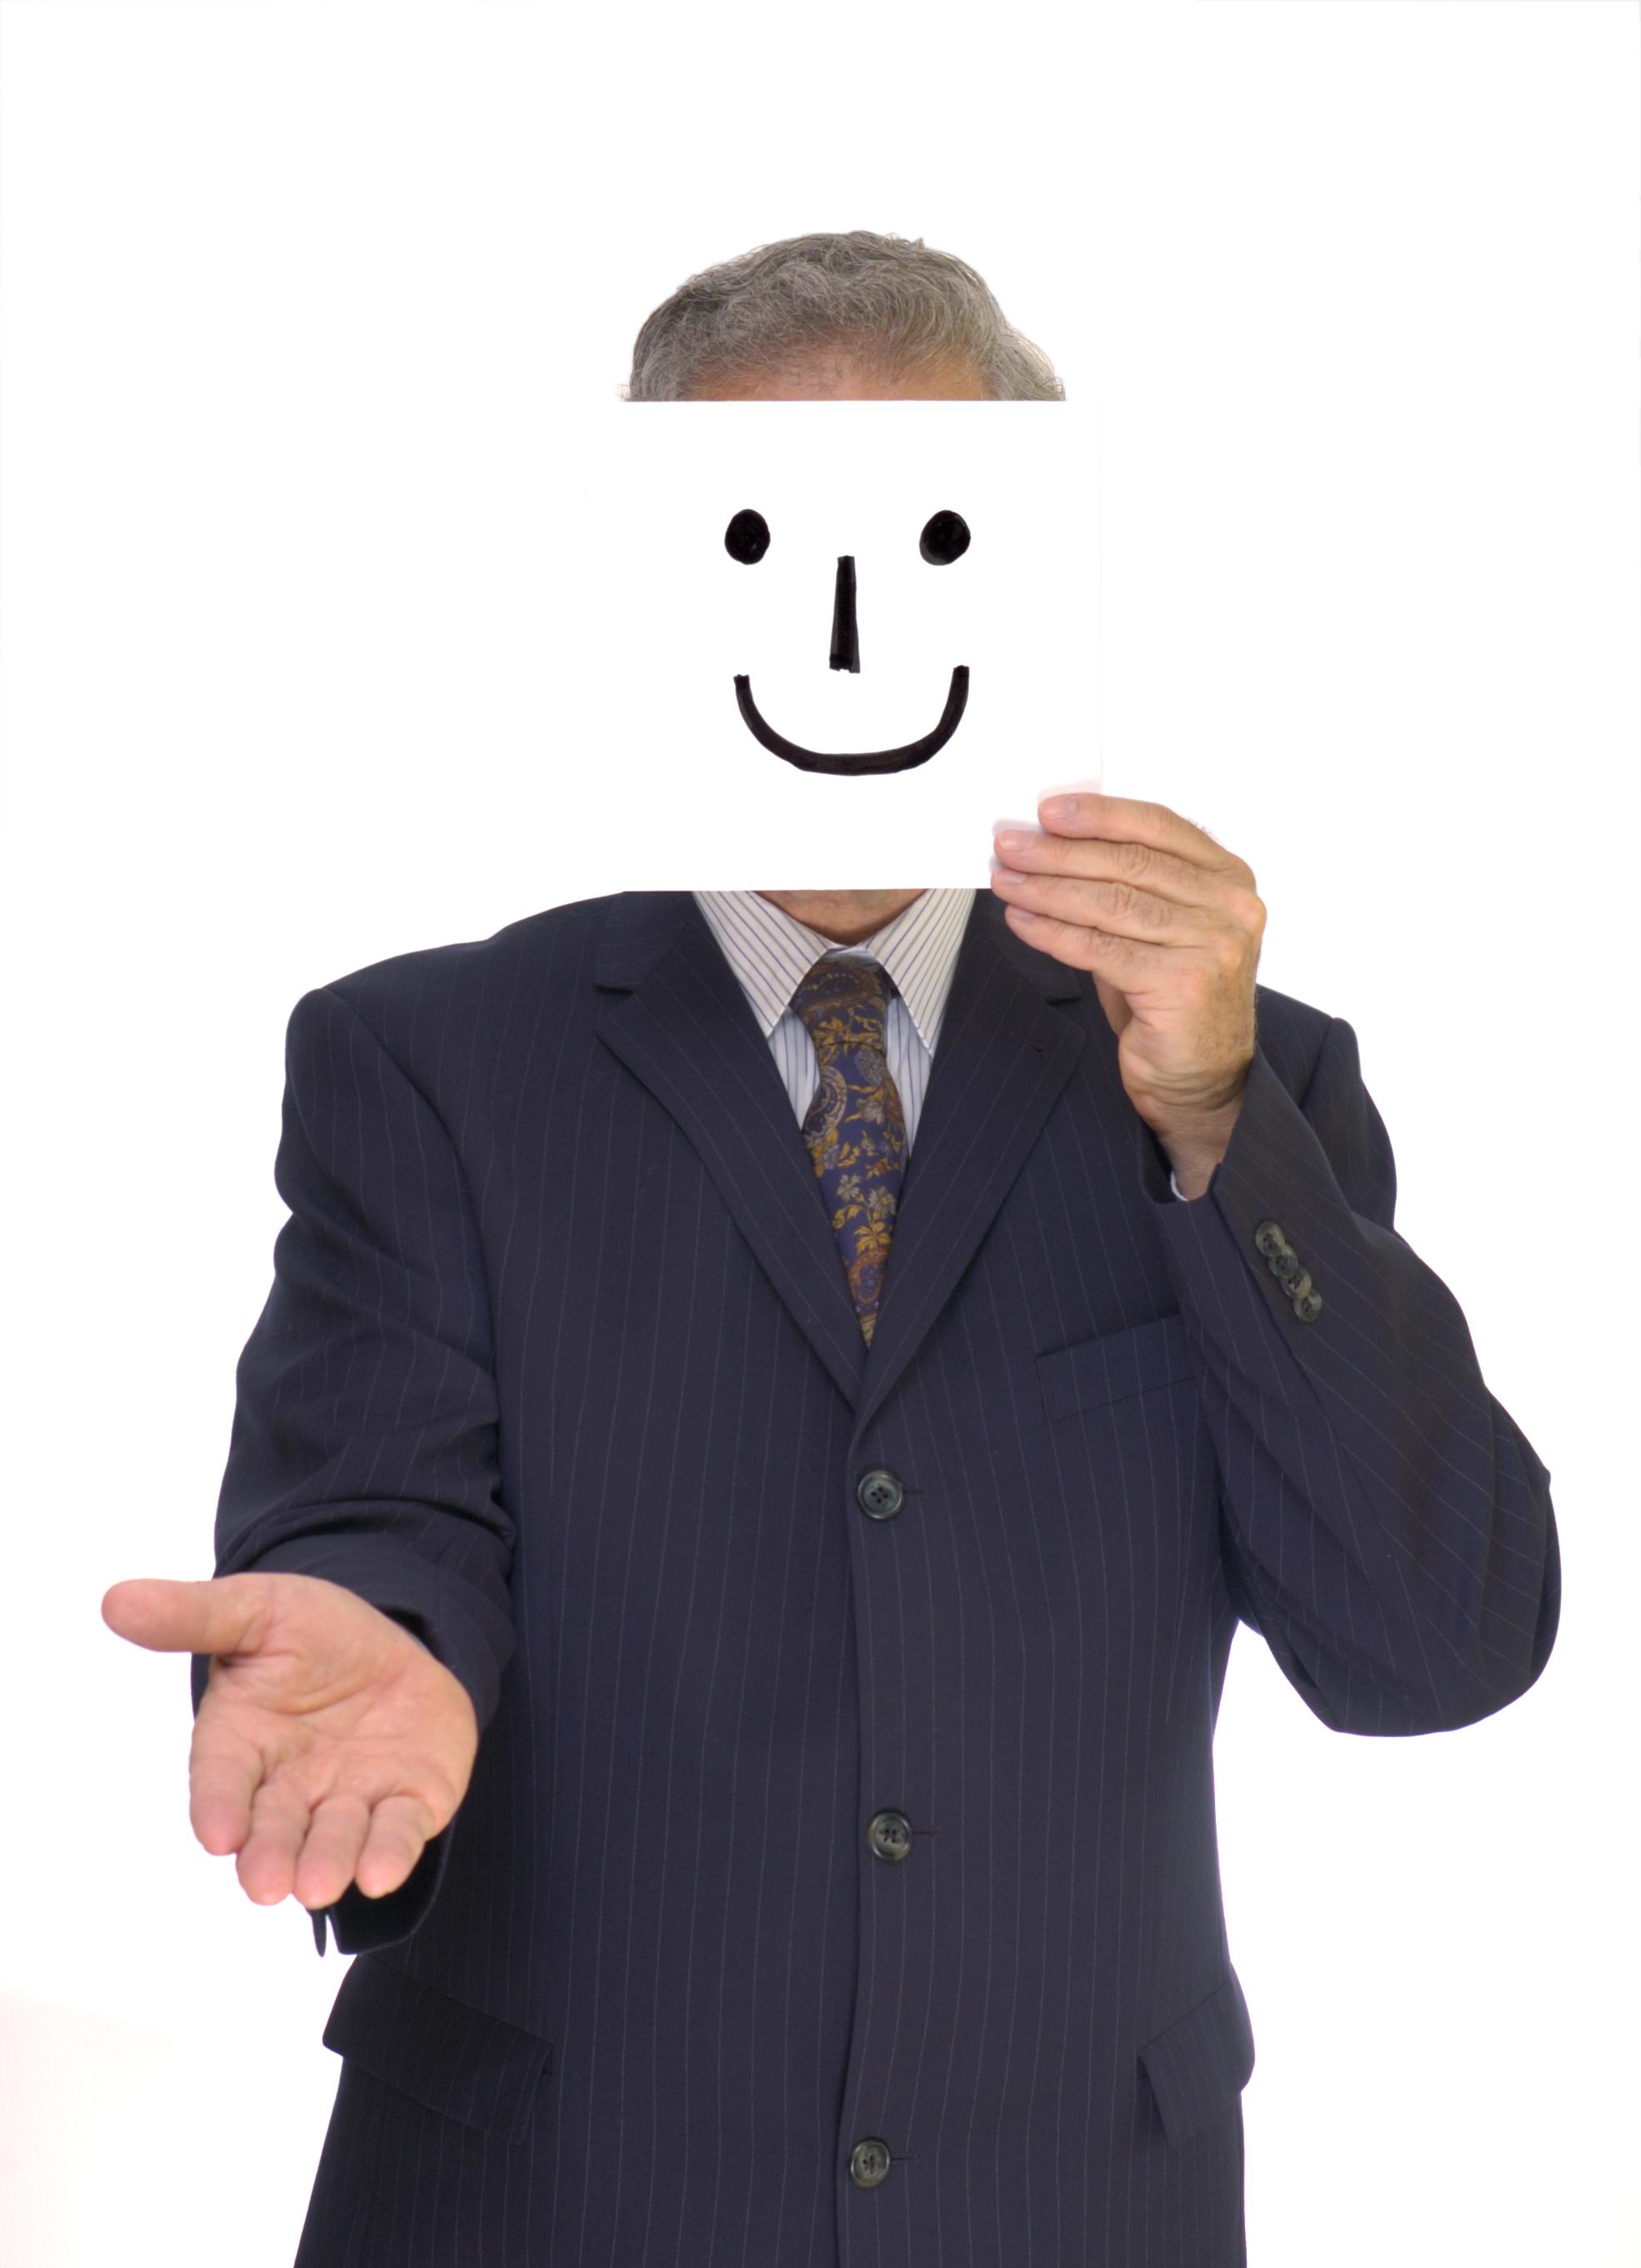 Preventing Impostor Scams